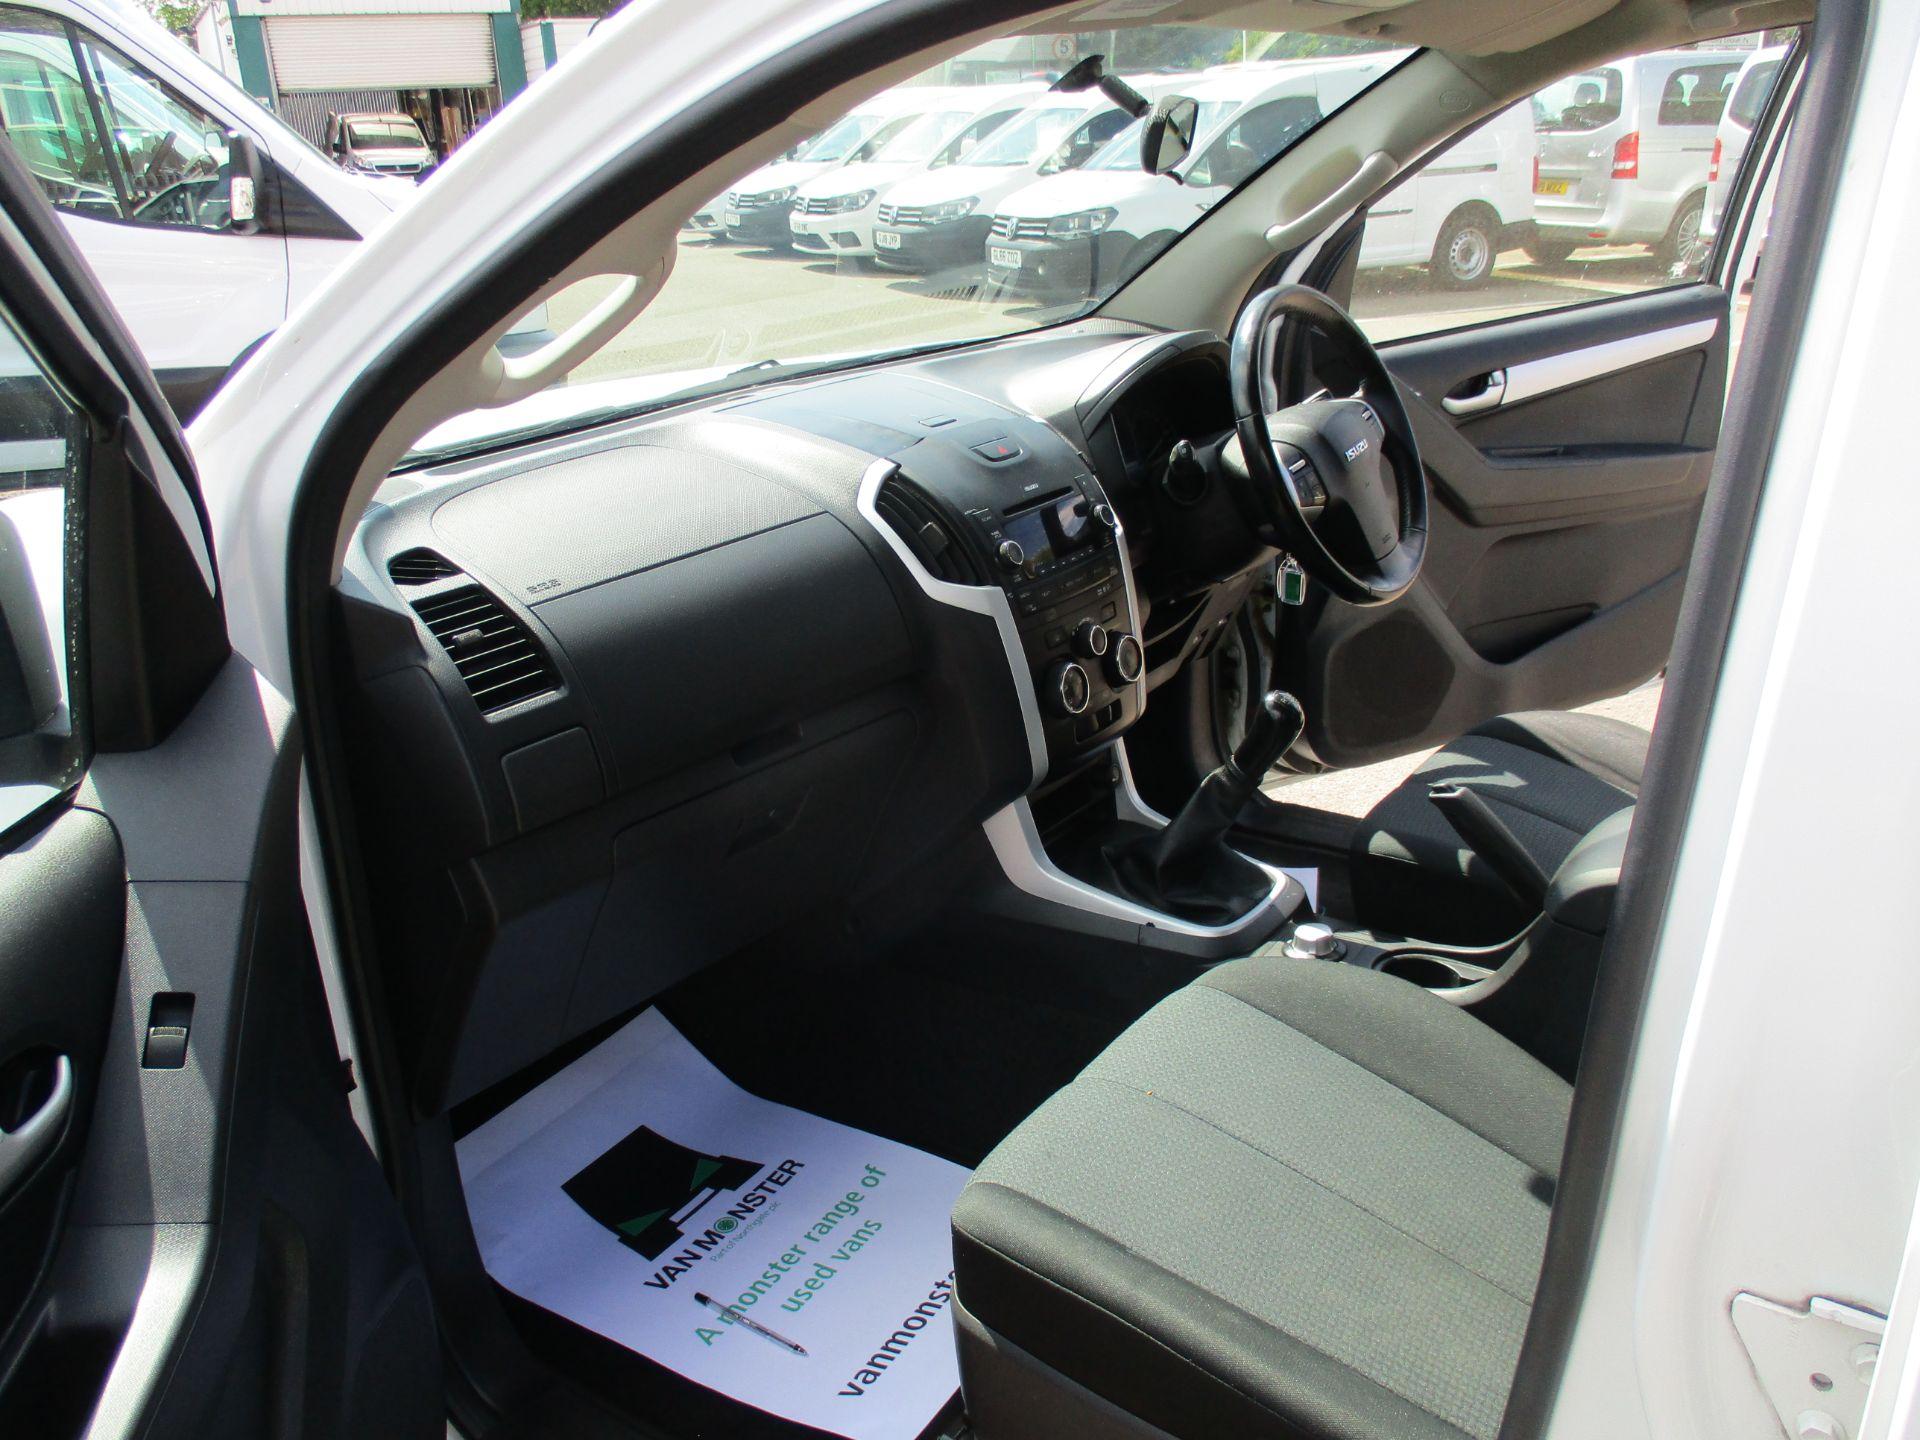 2016 Isuzu D-Max 2.5Td Yukon Double Cab 4X4 (YD66XHG) Image 15